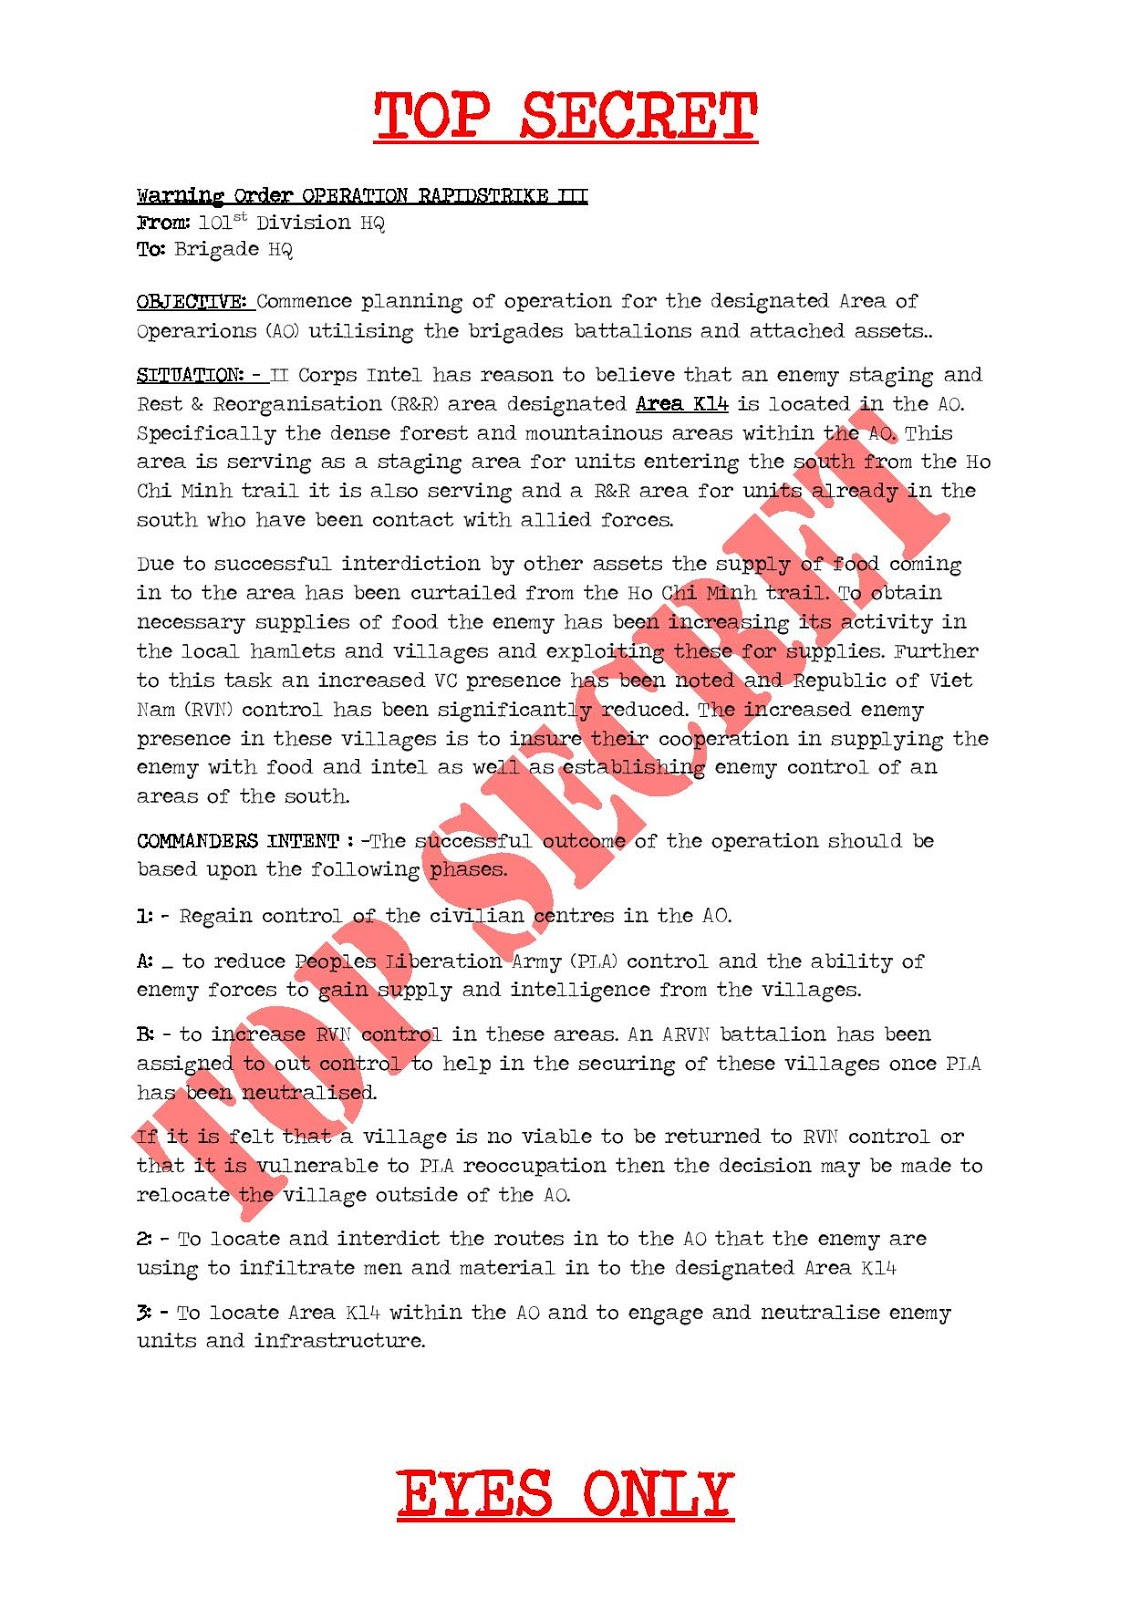 Rapidstrike III: Operation Rapidstrike III Warning Order 1